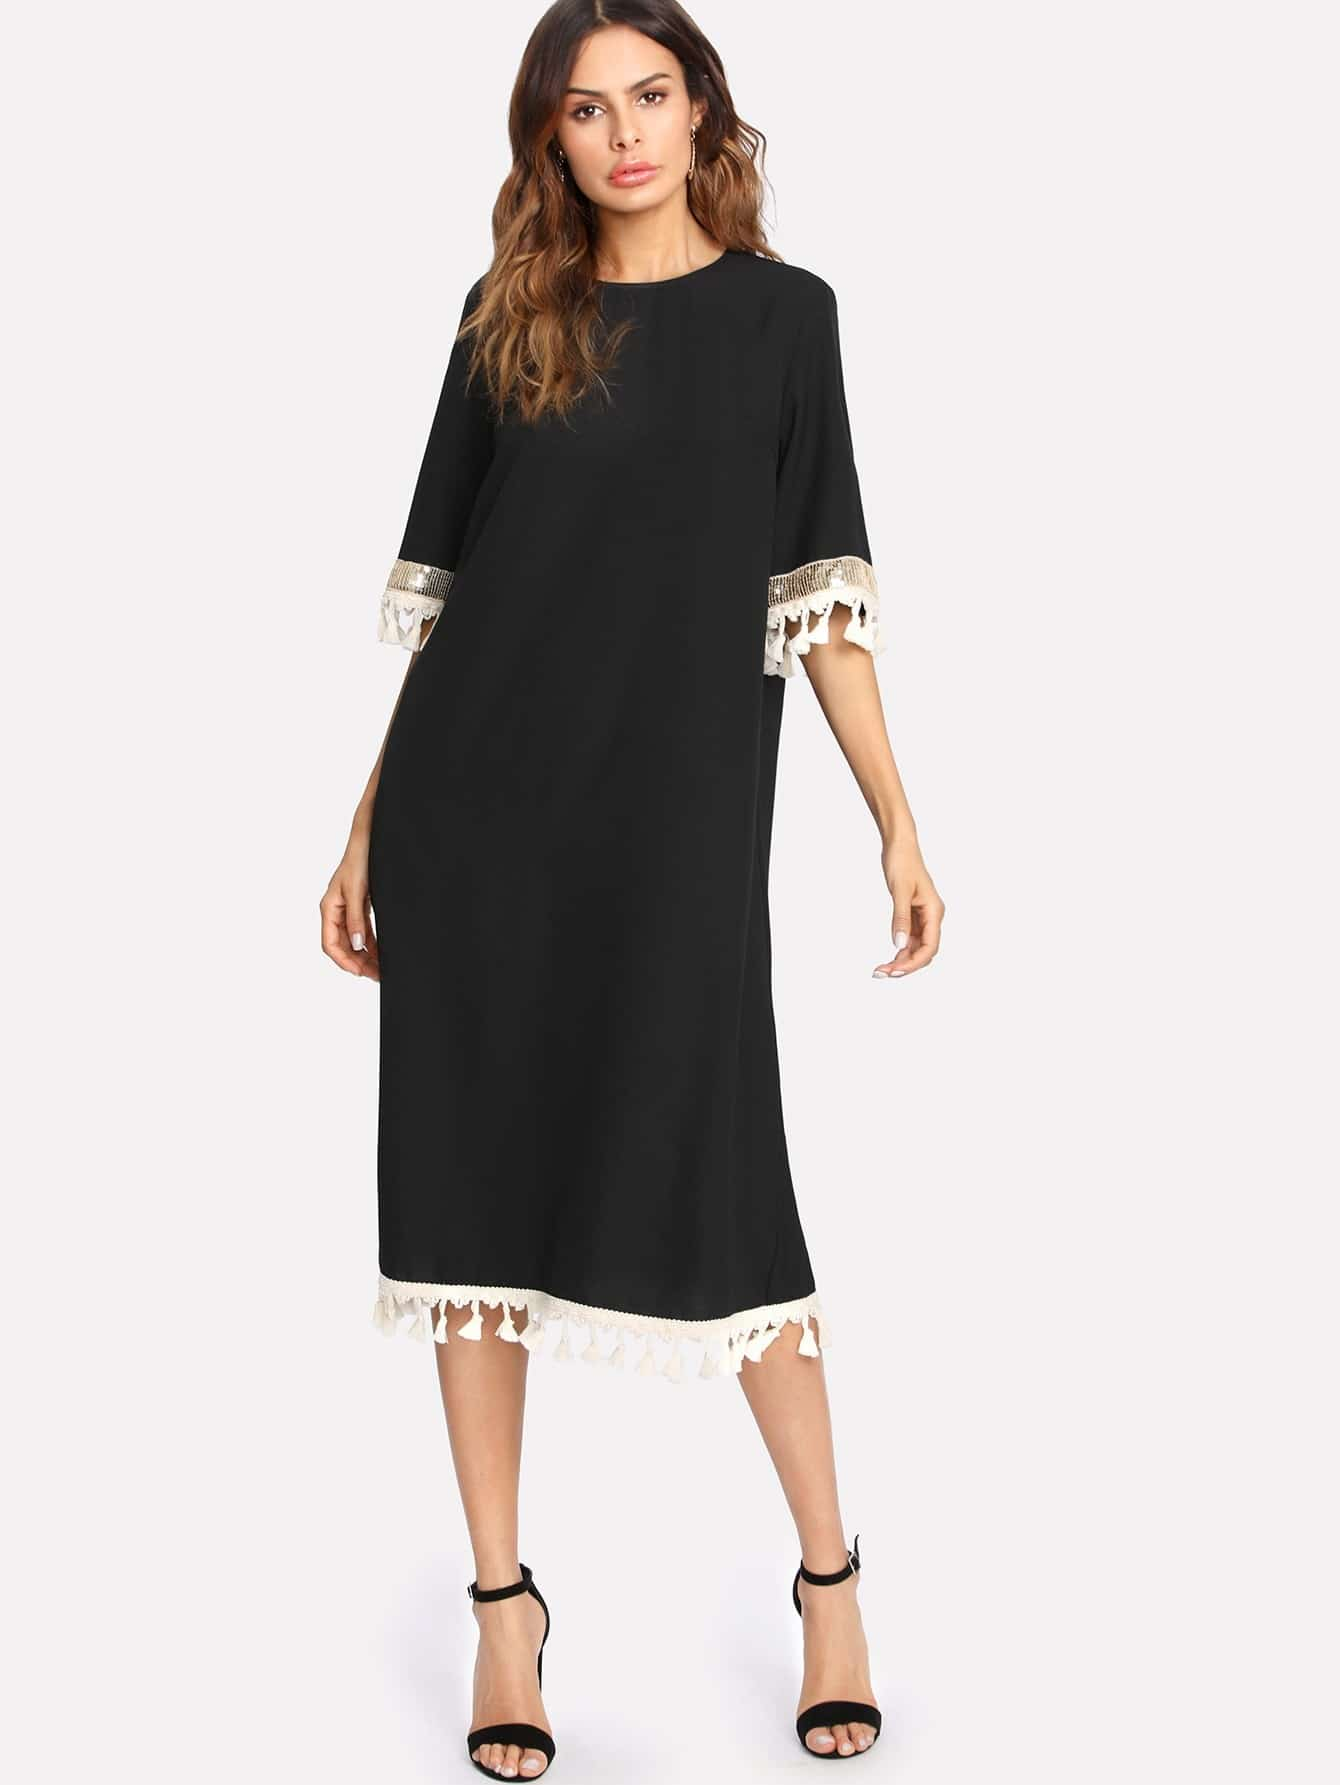 Sequin And Tassel Detail Belted Dress dress171120719